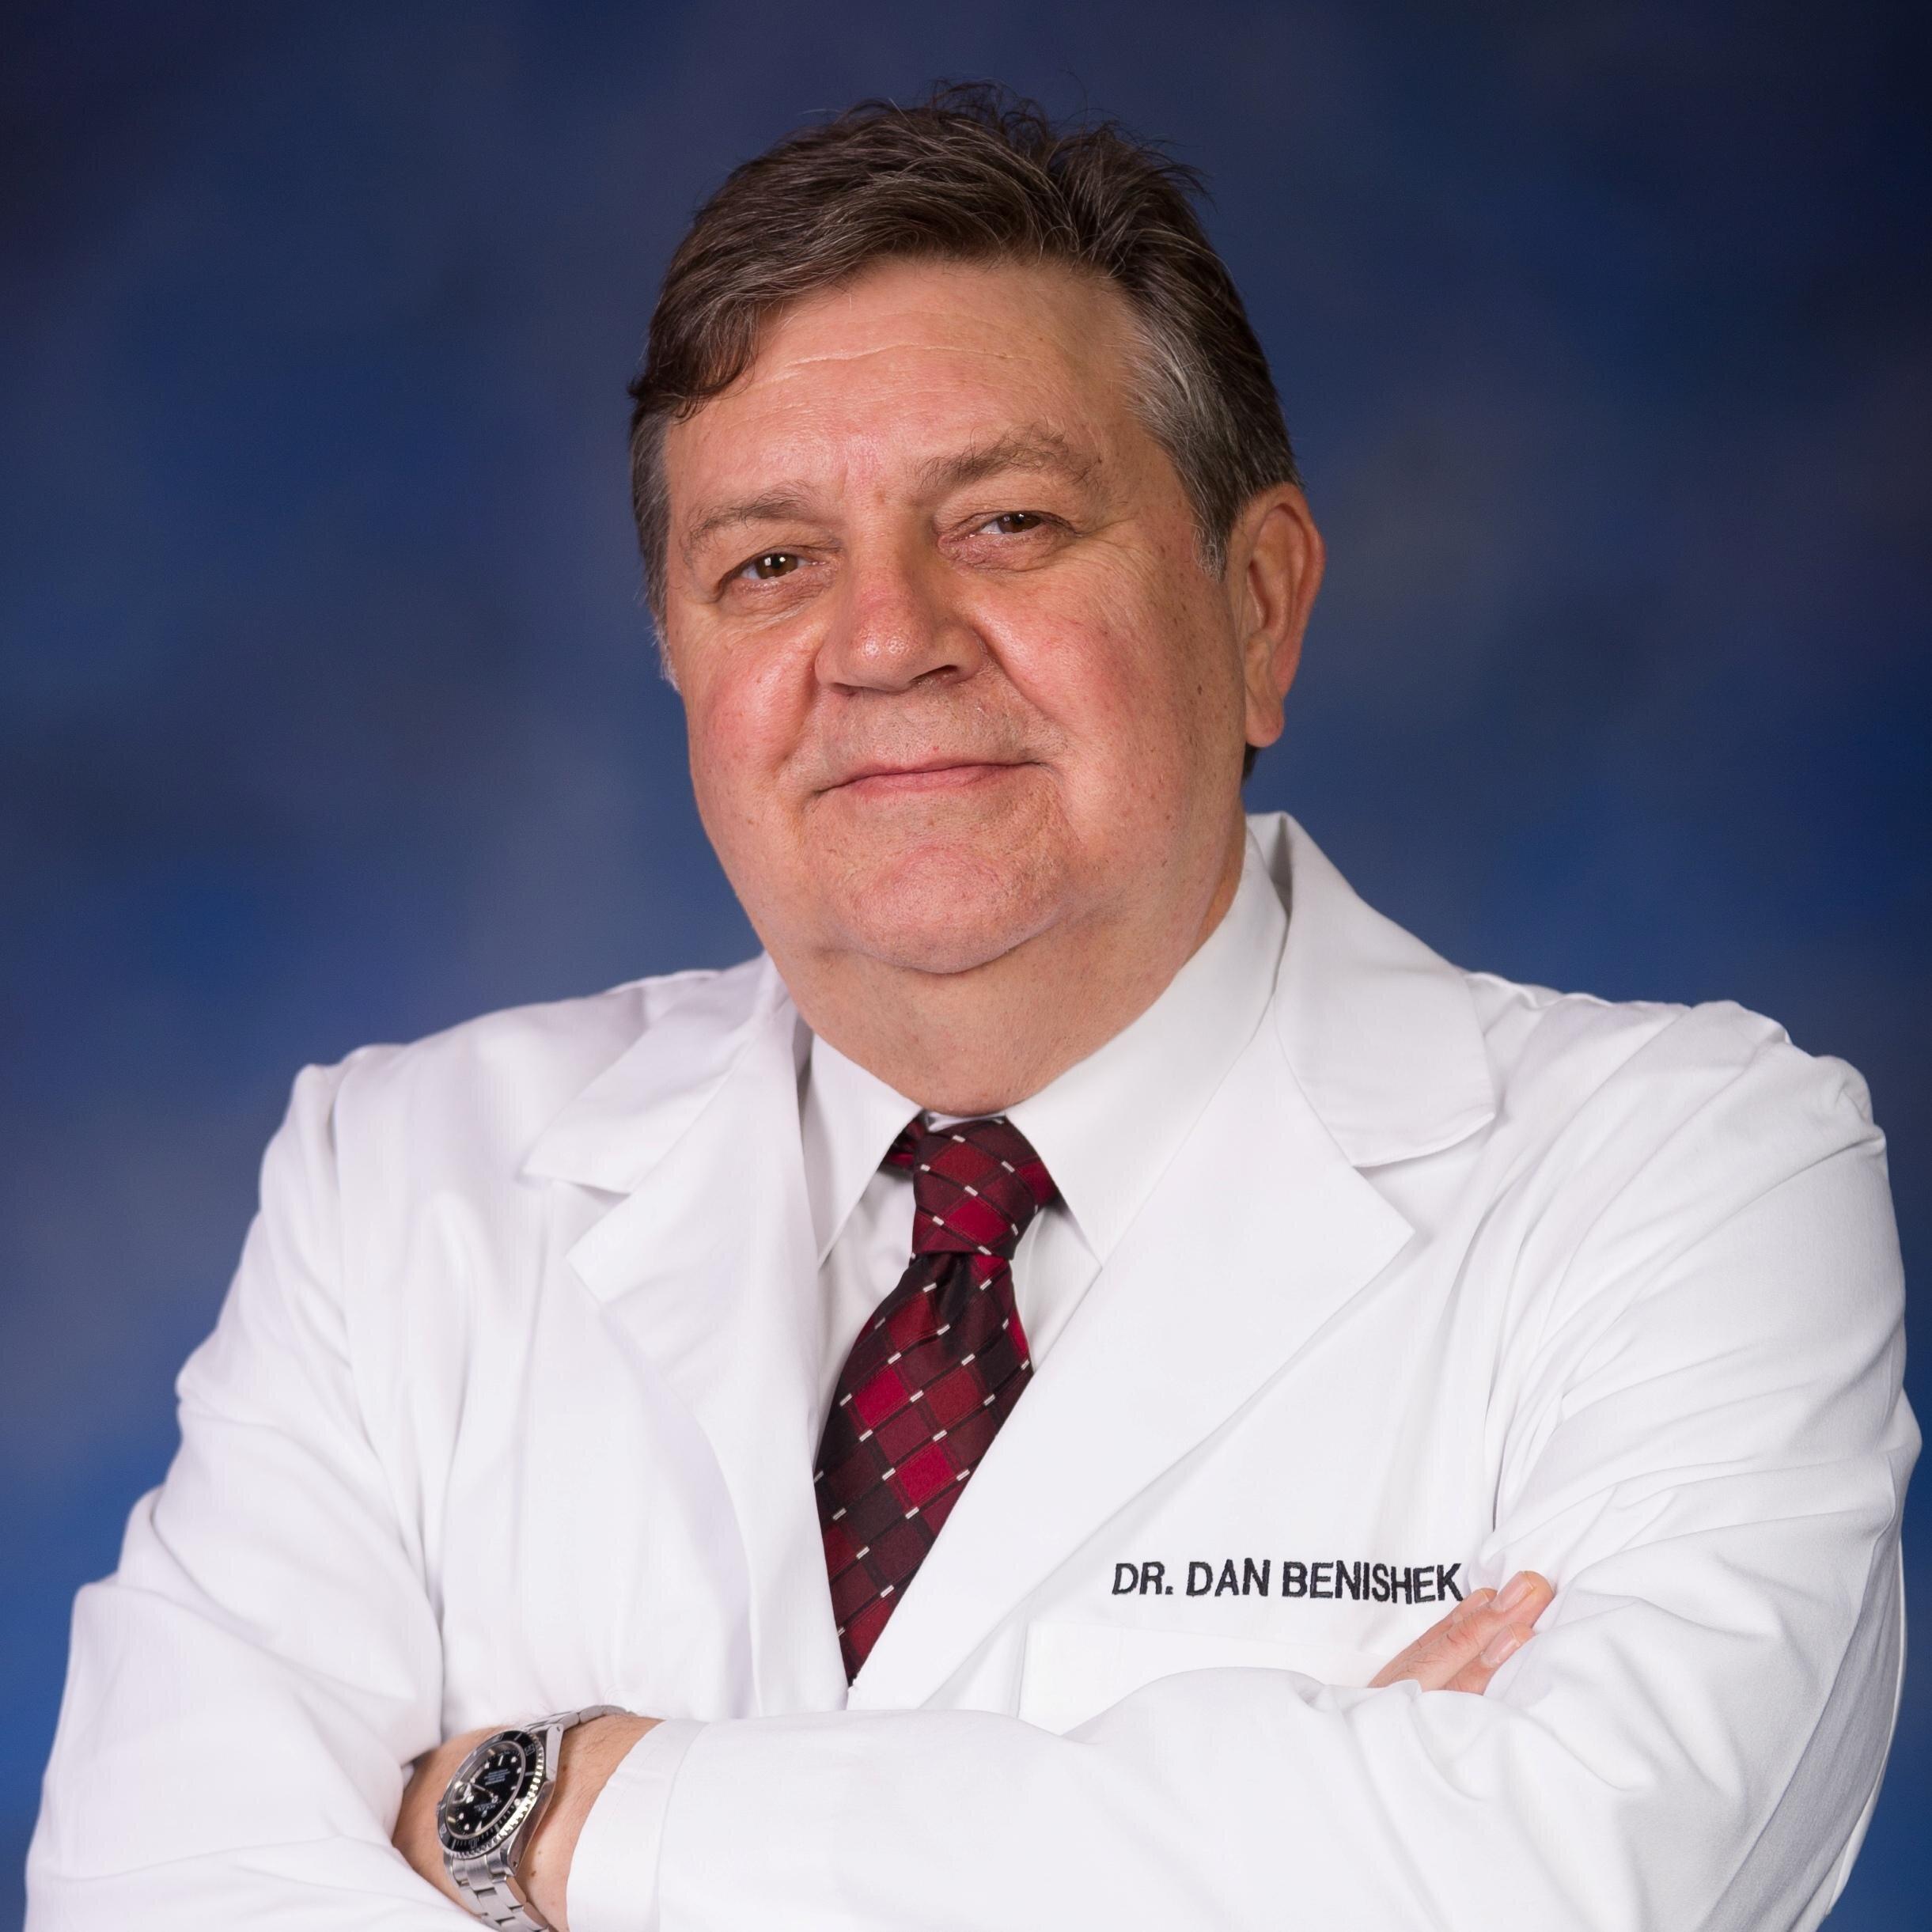 Dr. Dan Benishek Social Profile